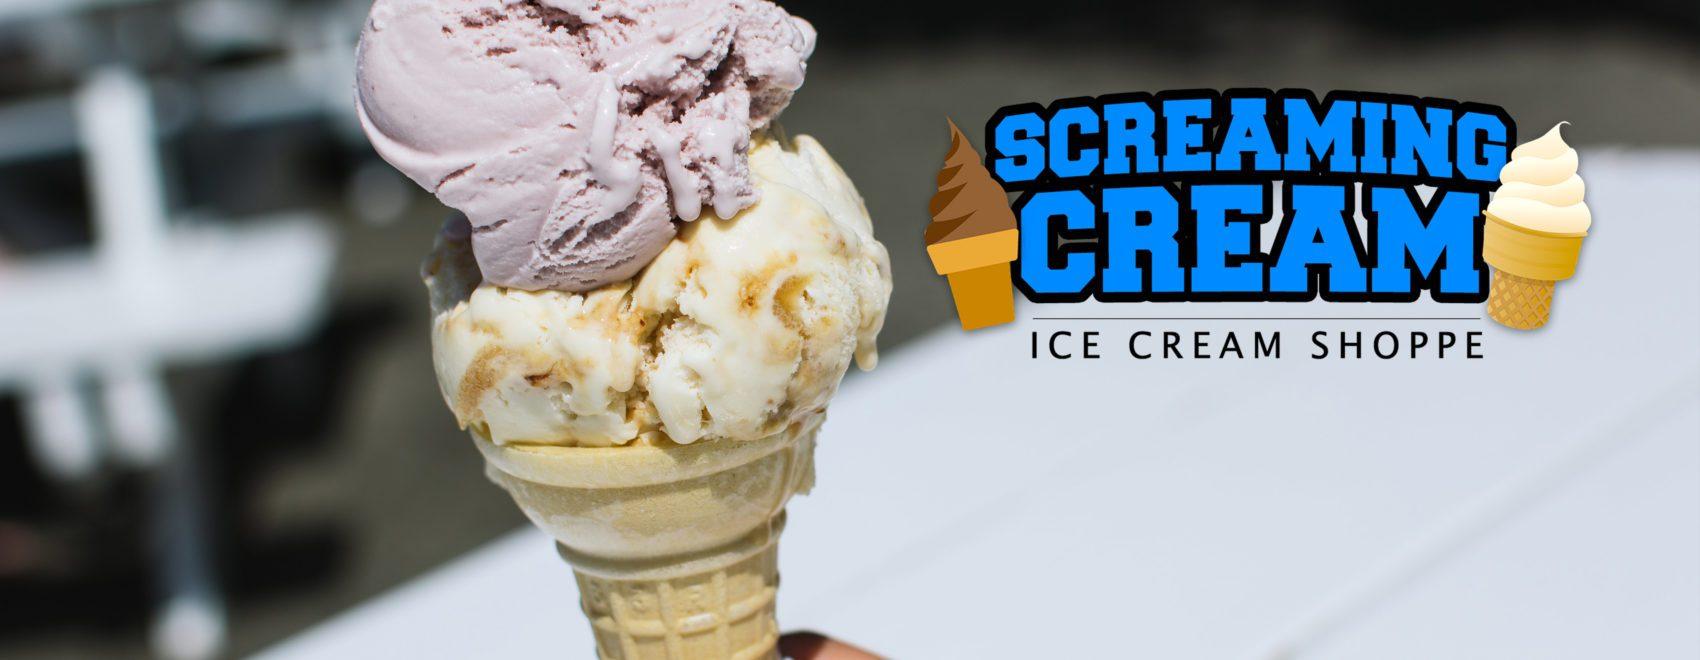 Screaming Cream Ice Cream Shoppe